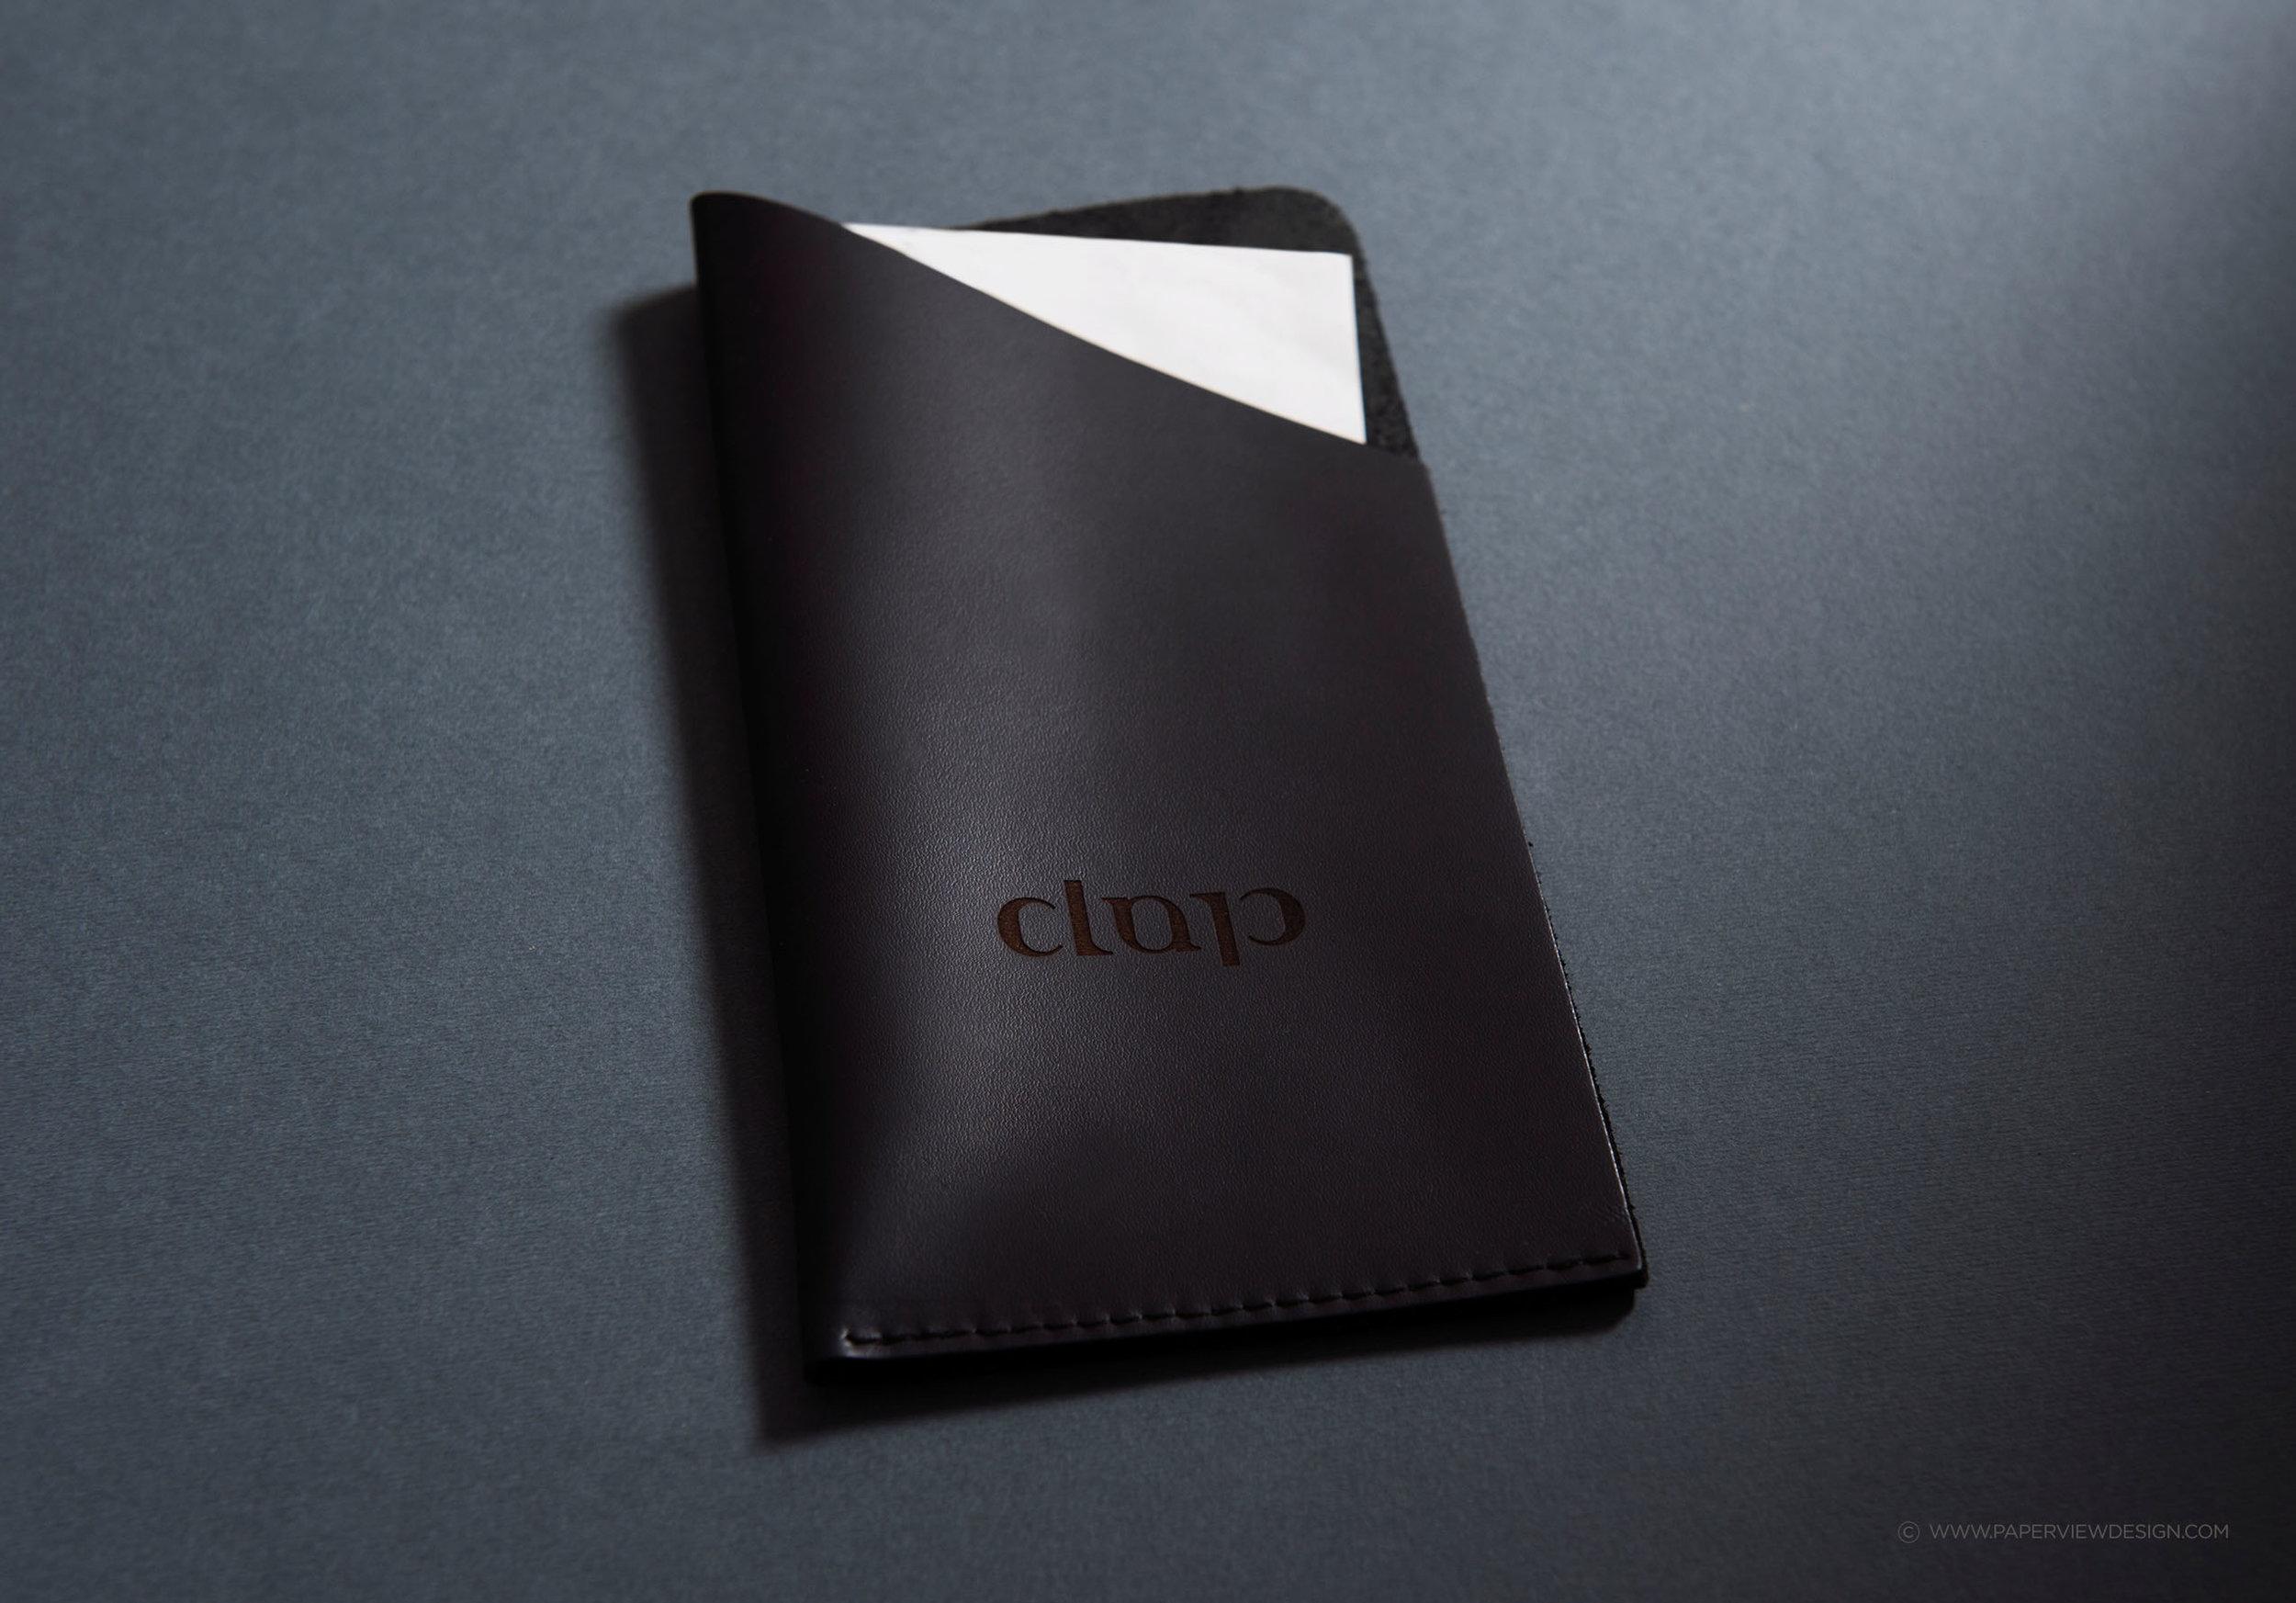 Clap-Japanese-Contemporary-Cuisine-Bill-Holder-Identity-Branding